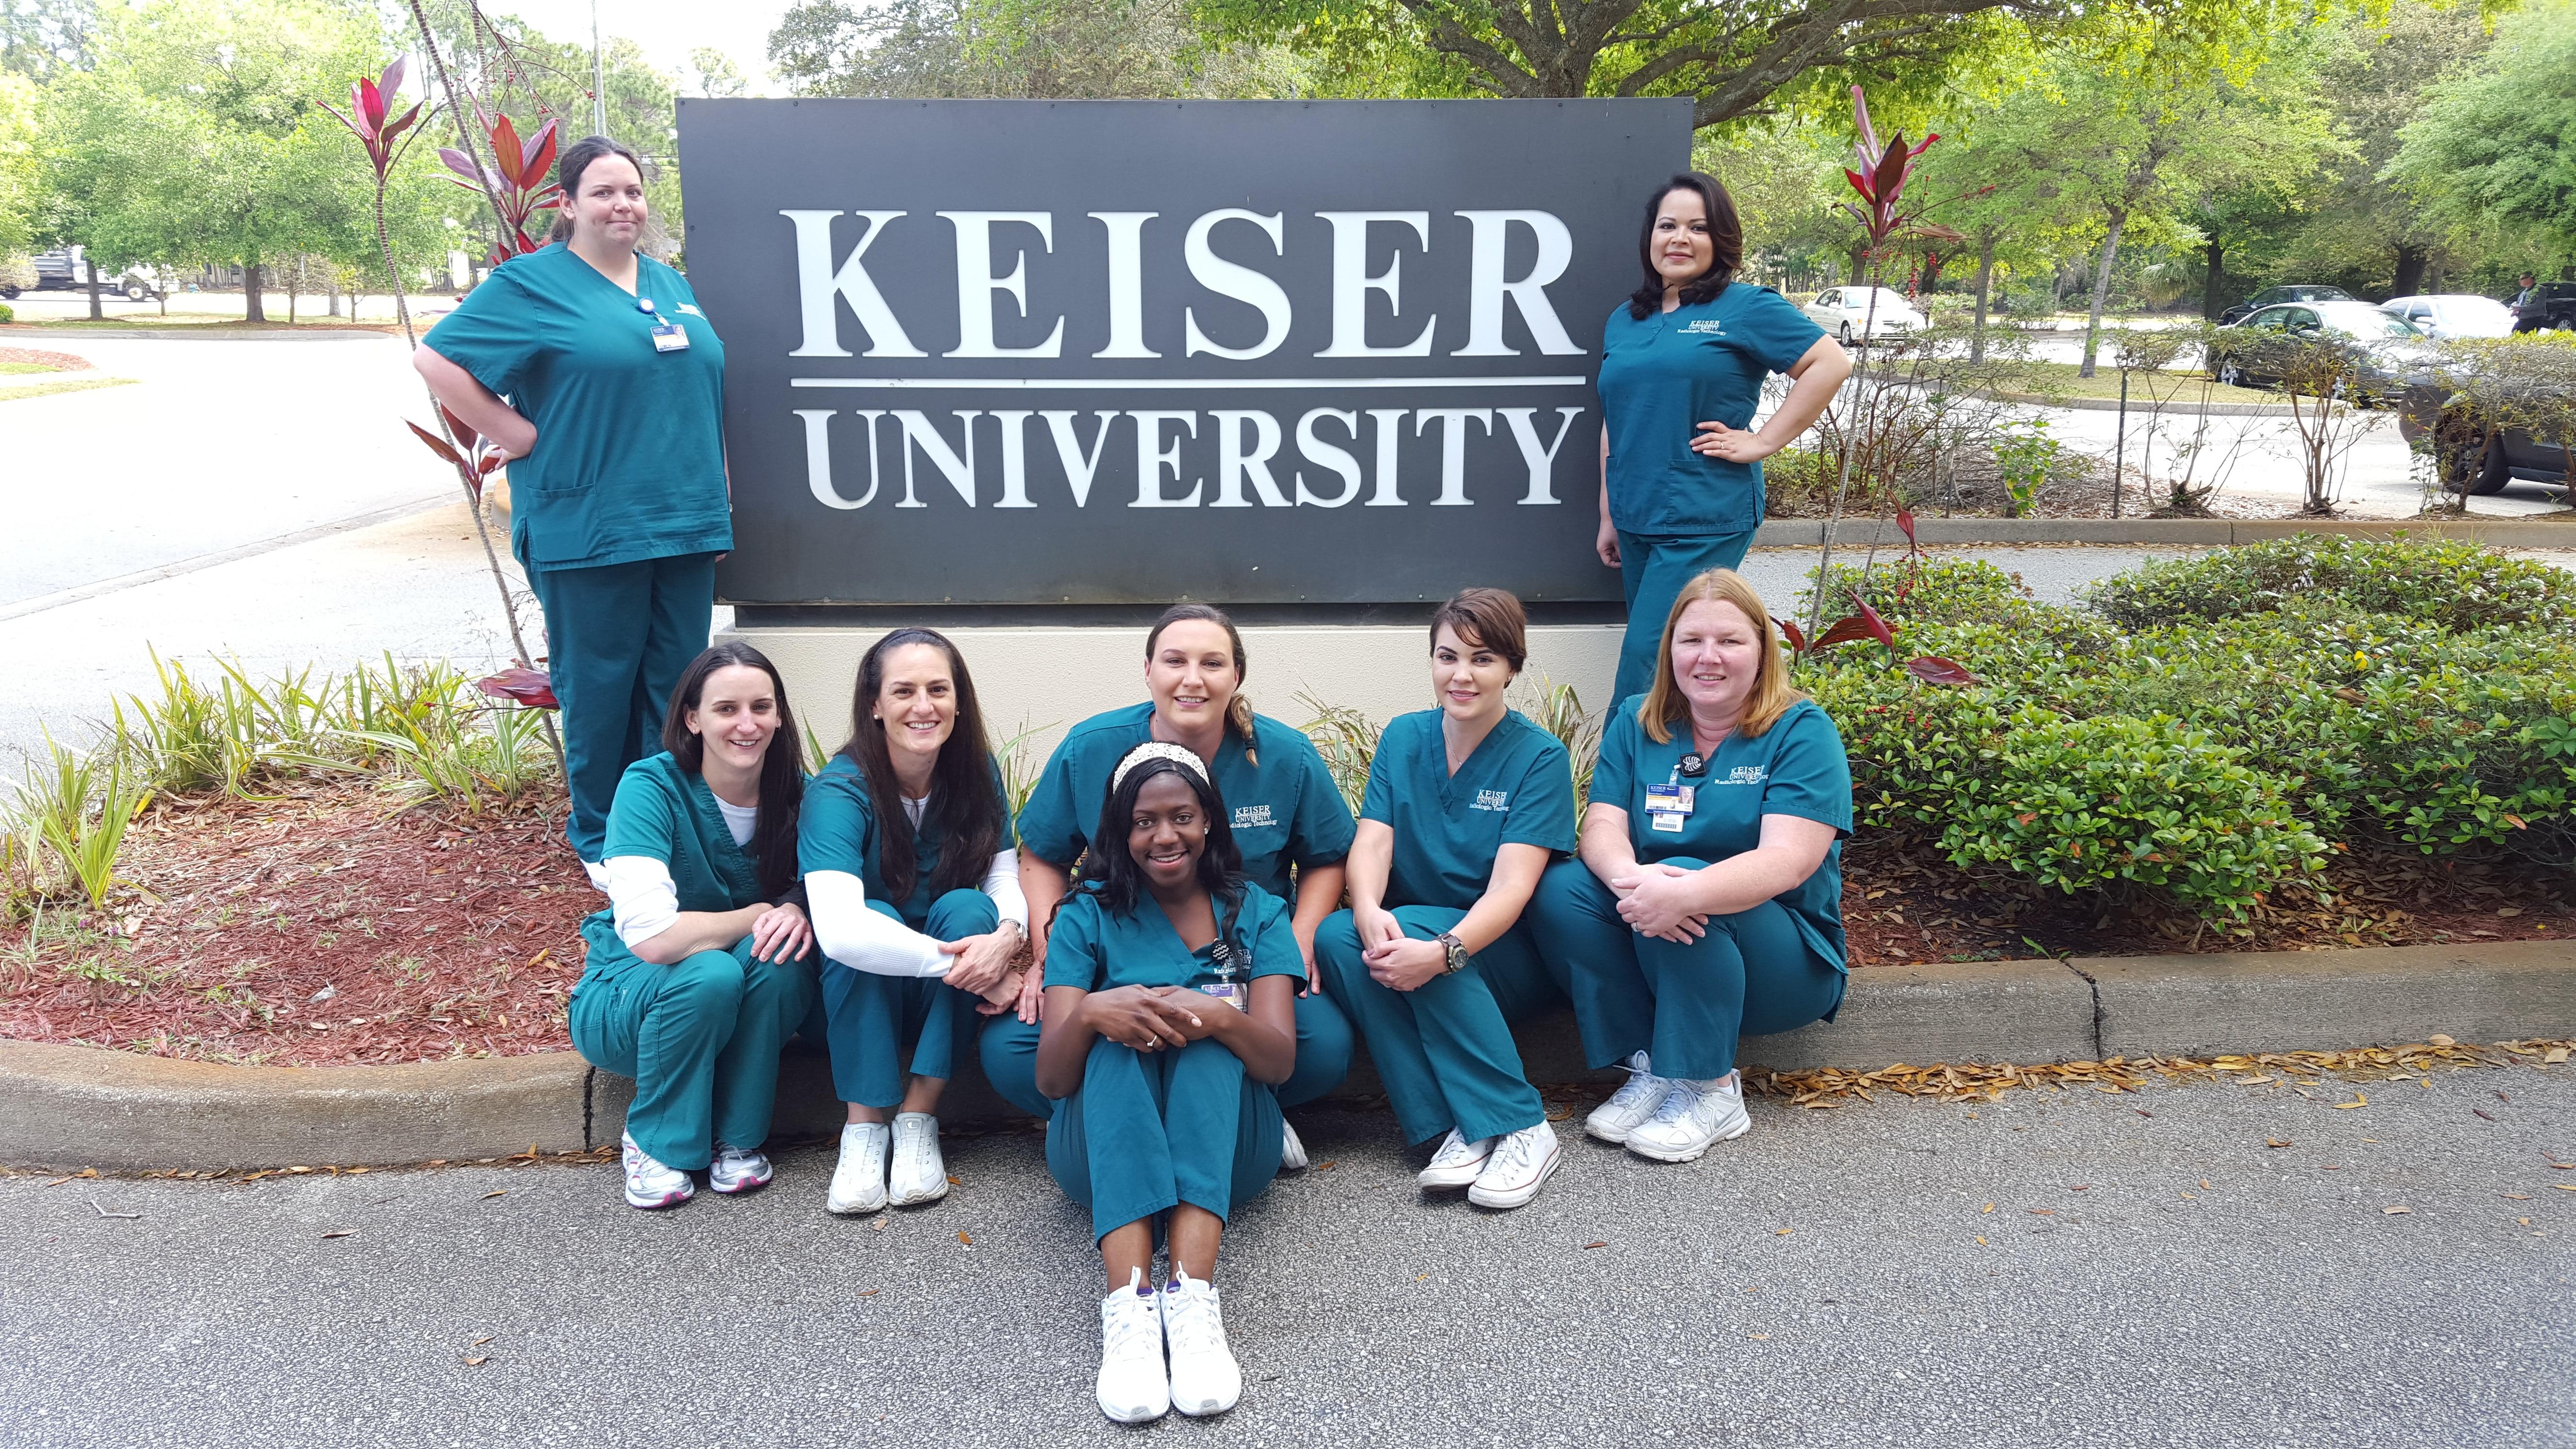 Keiser University Pinning Ceremonies Keiser University